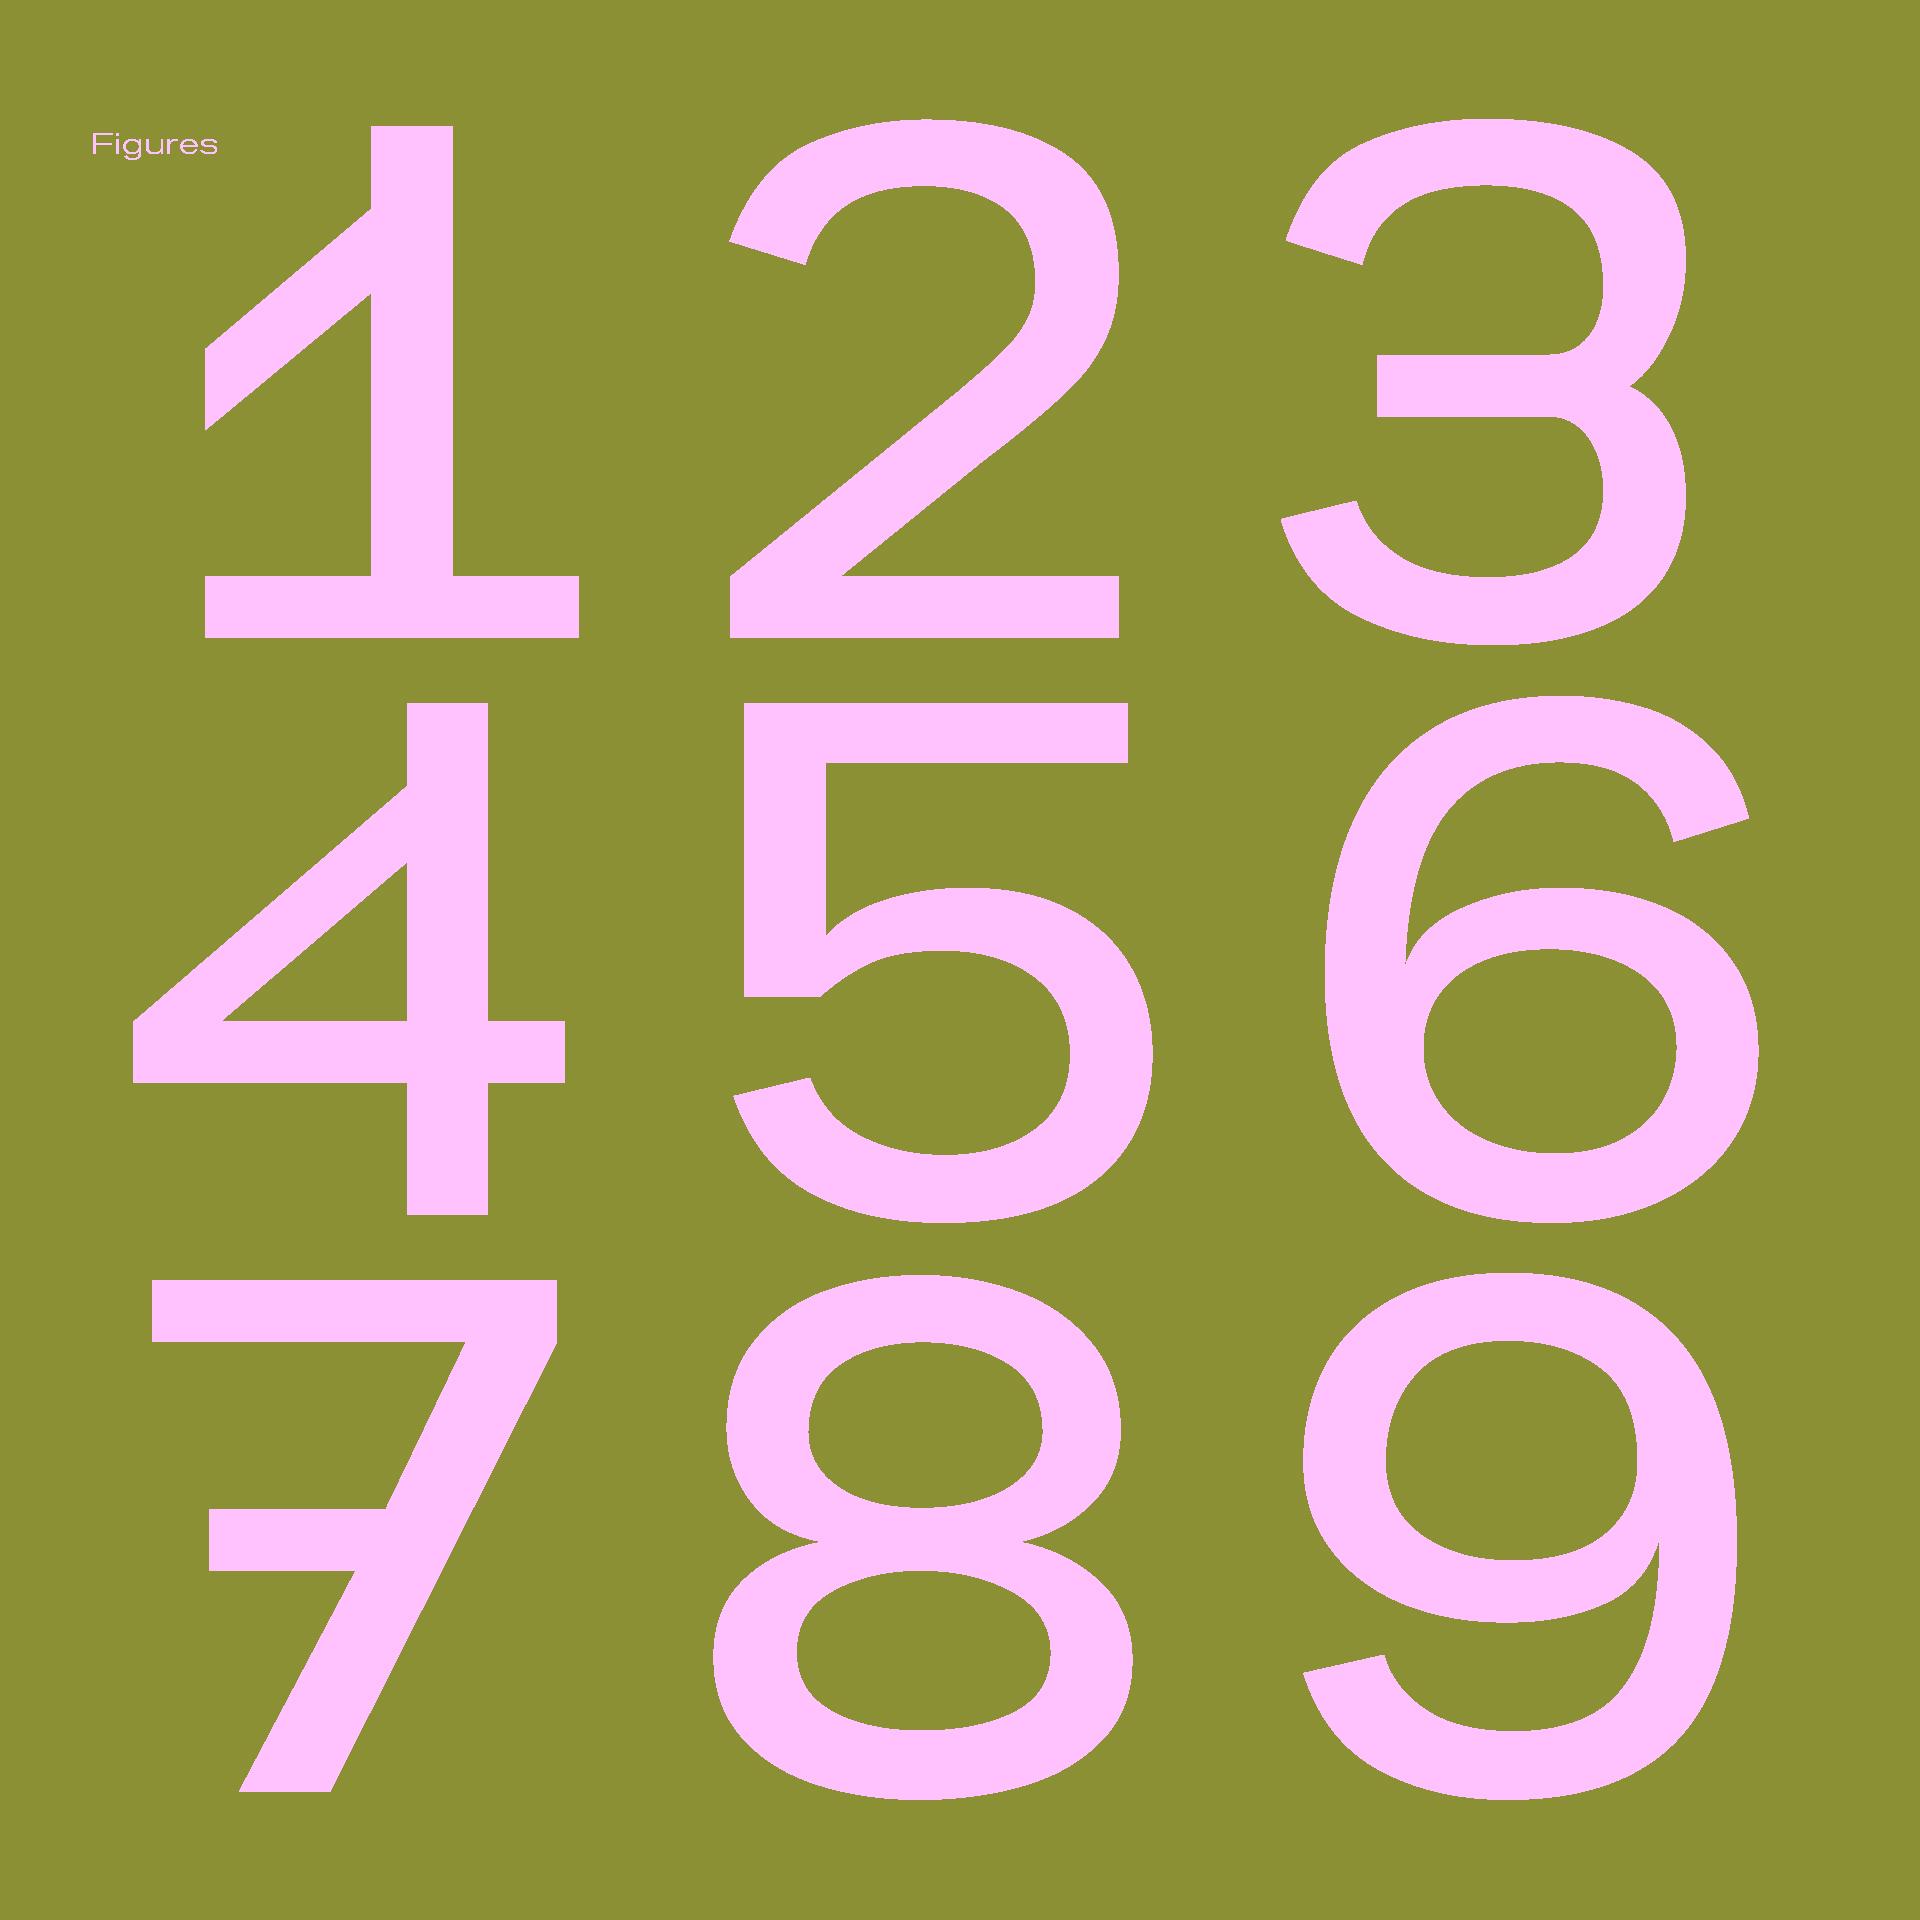 Kritik Typeface Figures